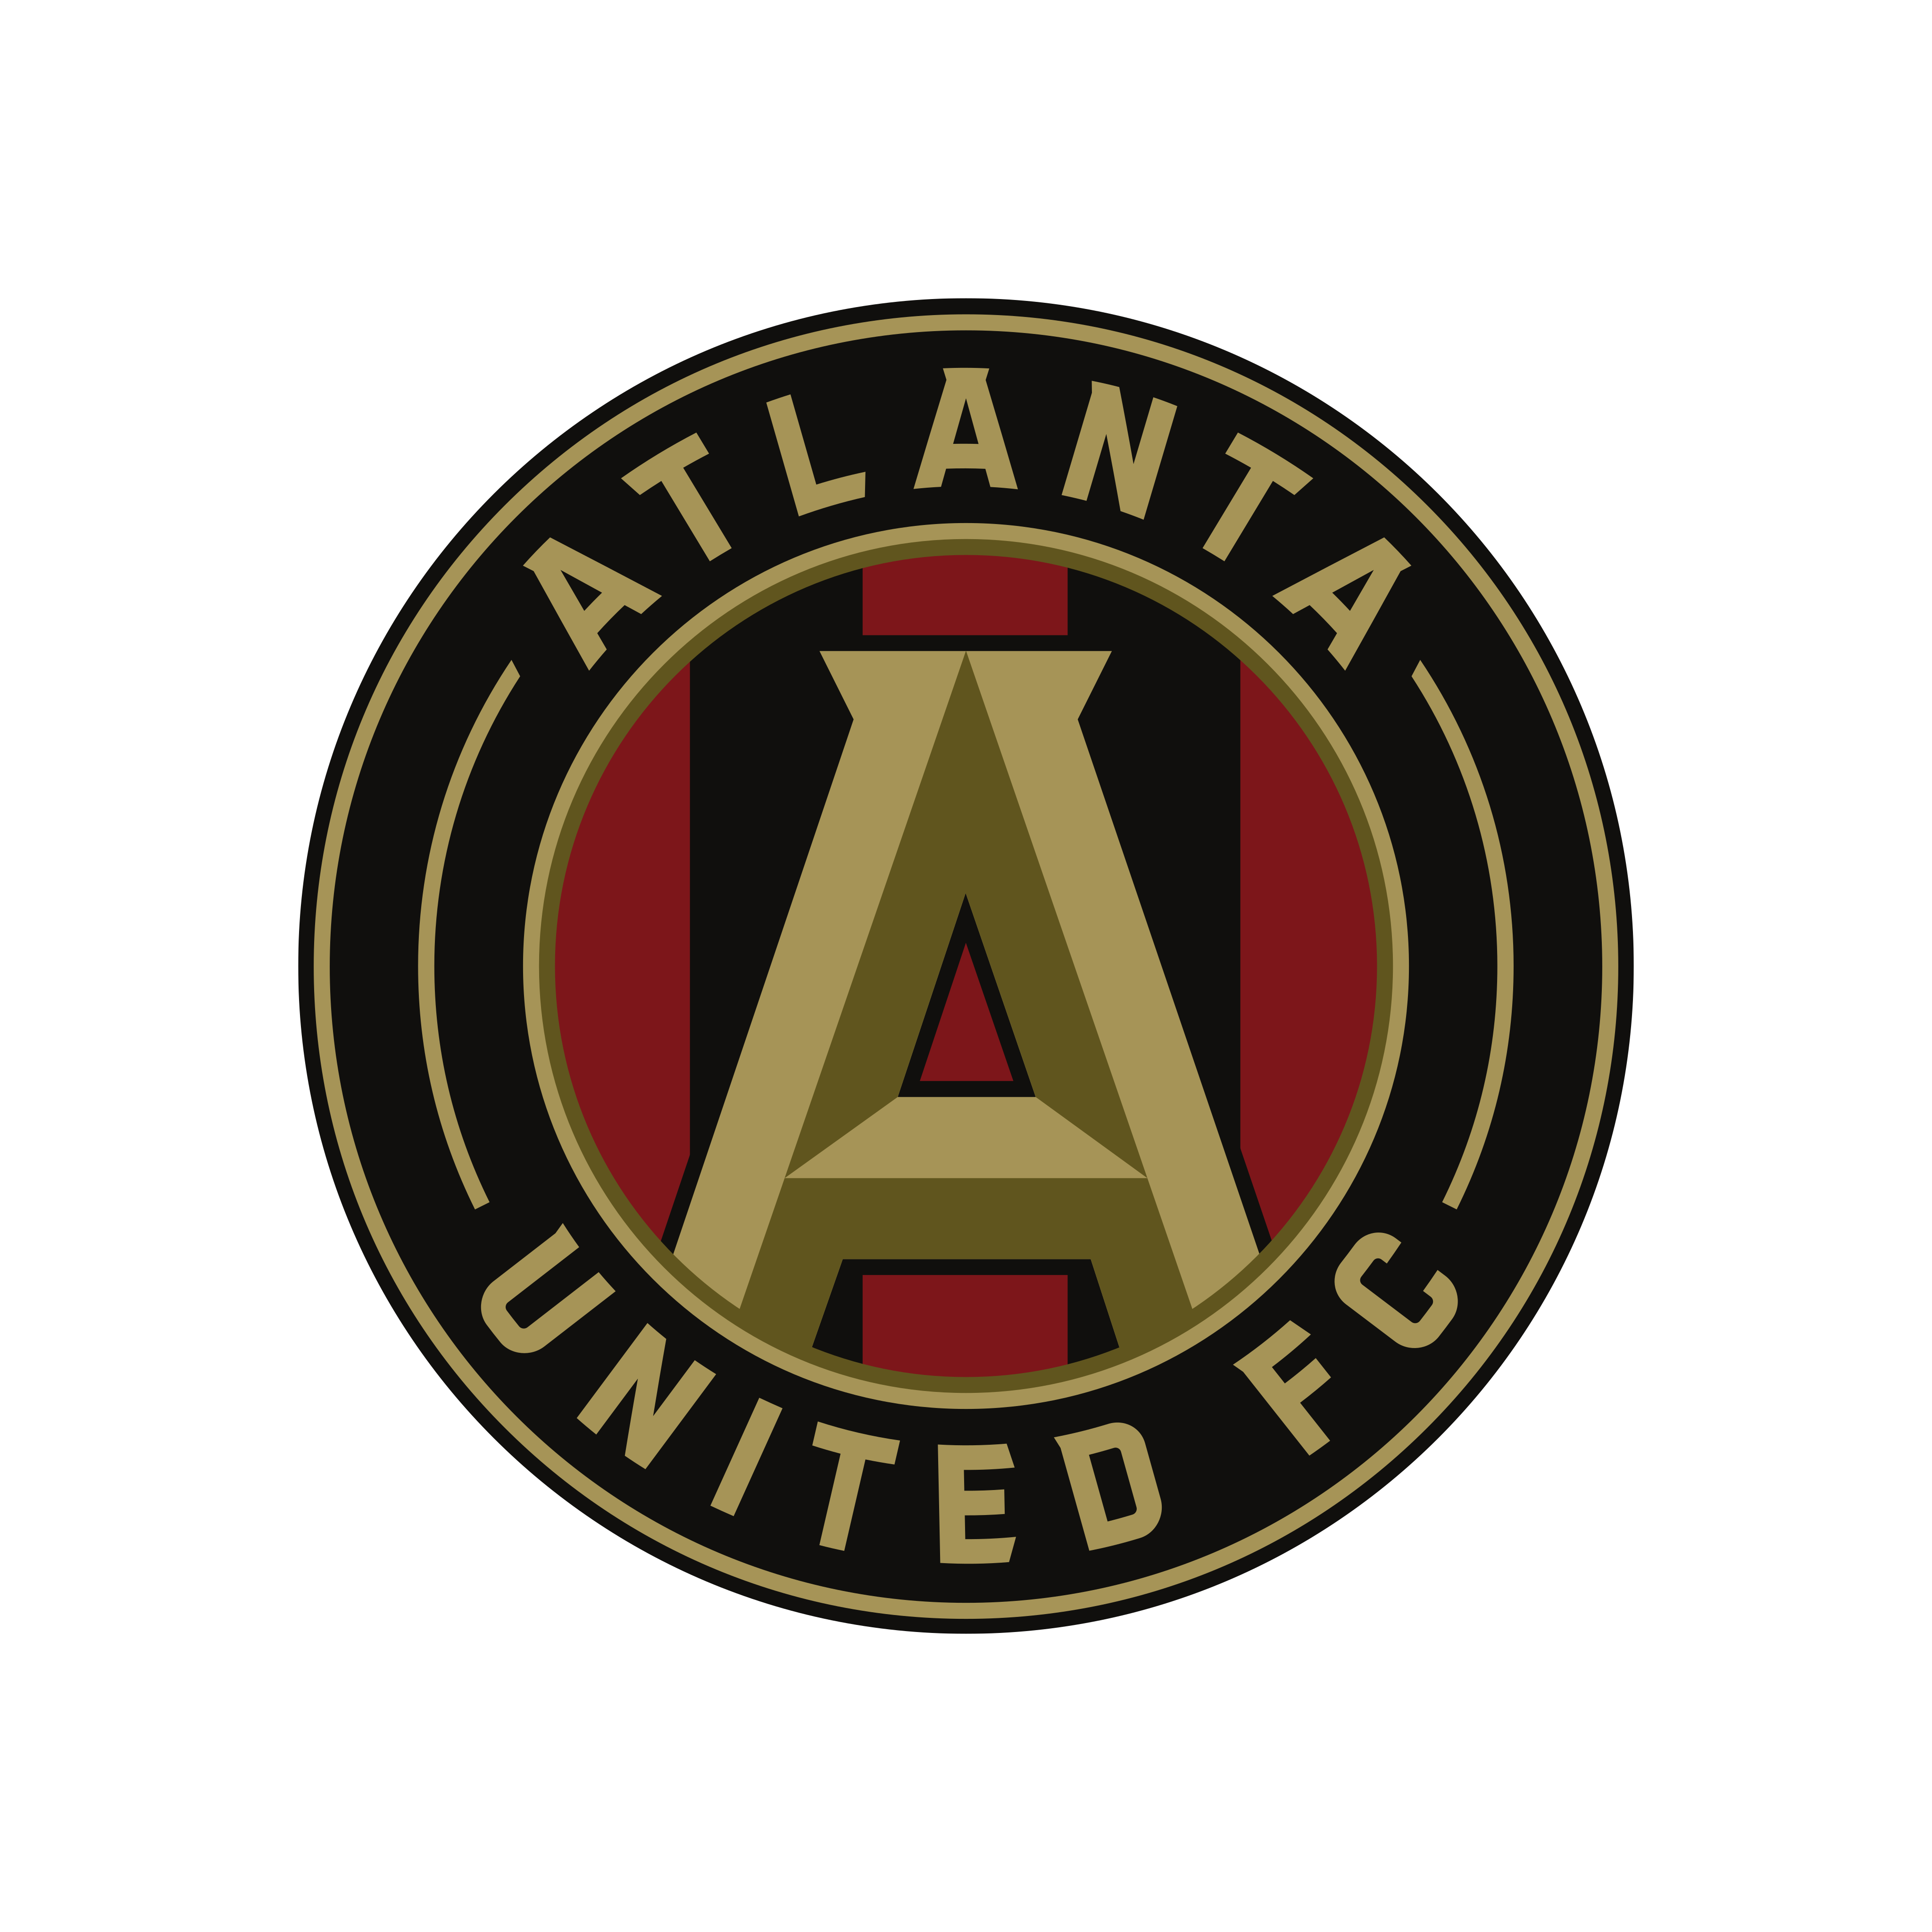 atlanta united fc logo 0 - Atlanta United FC Logo